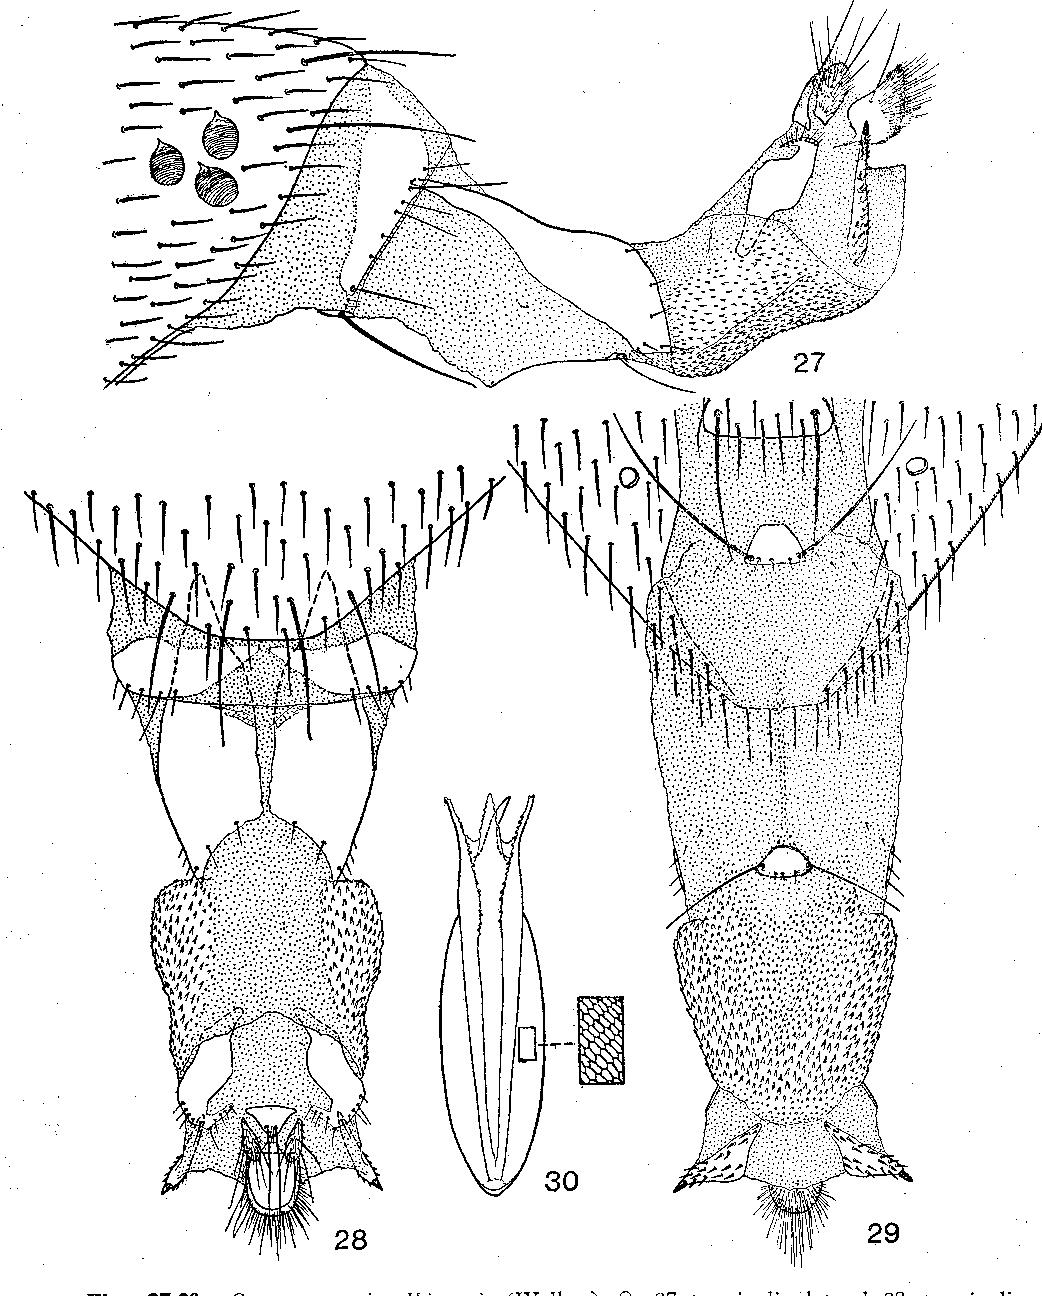 figure 27-30